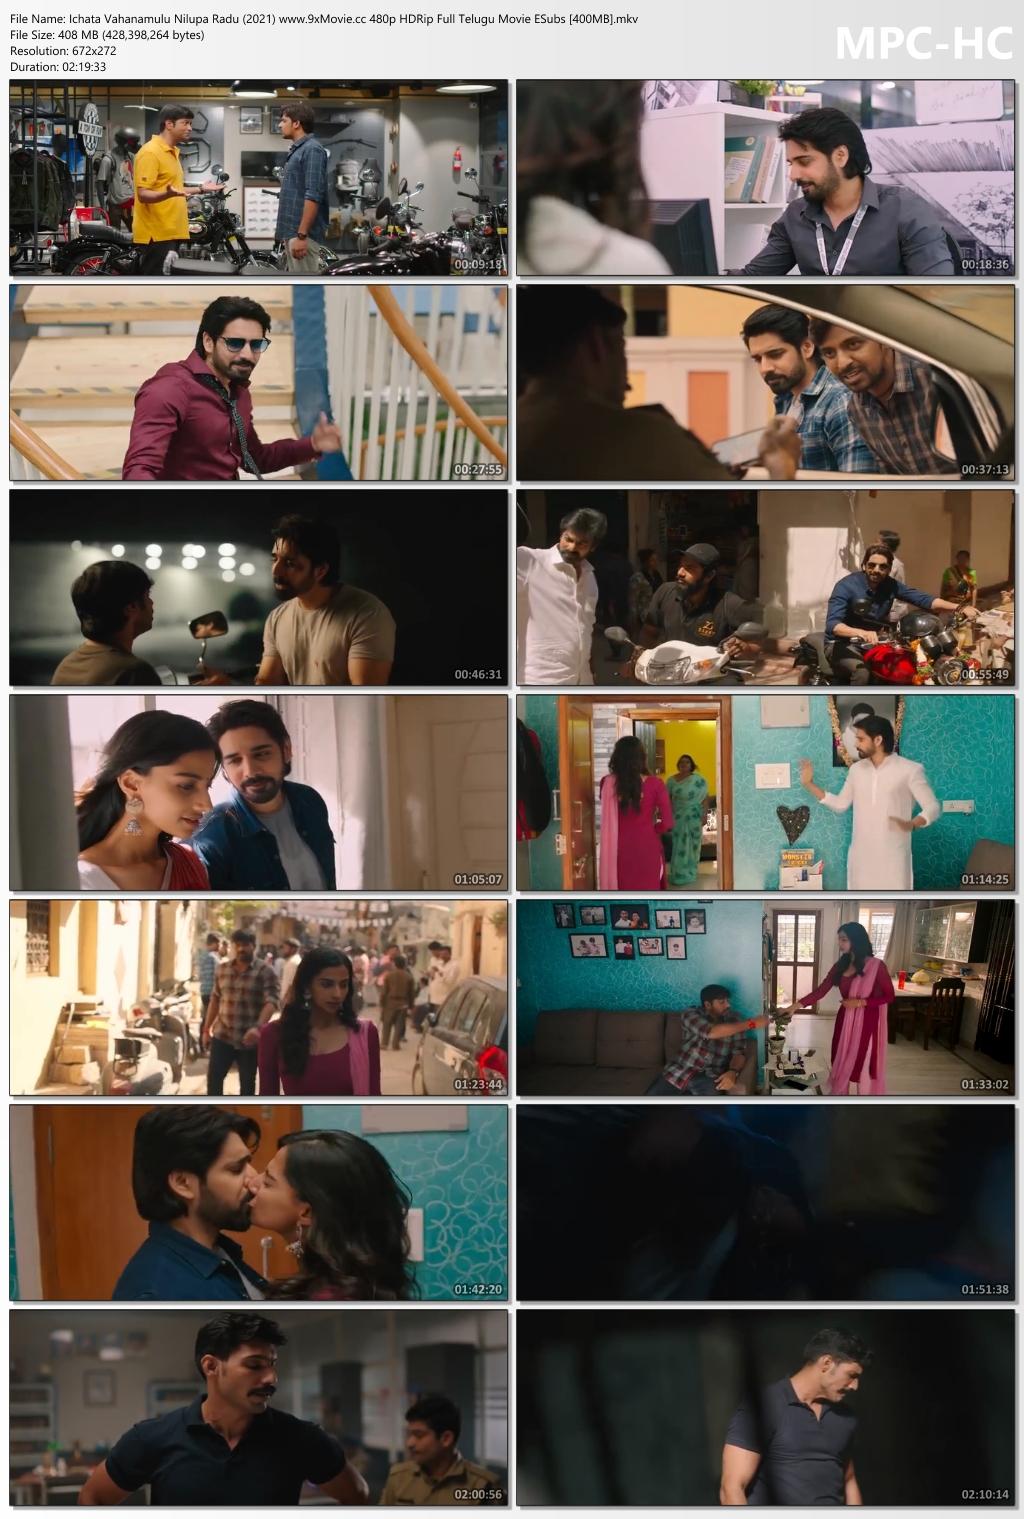 Ichata-Vahanamulu-Nilupa-Radu-2021-www-9x-Movie-cc-480p-HDRip-Full-Telugu-Movie-ESubs-400-MB-mkv